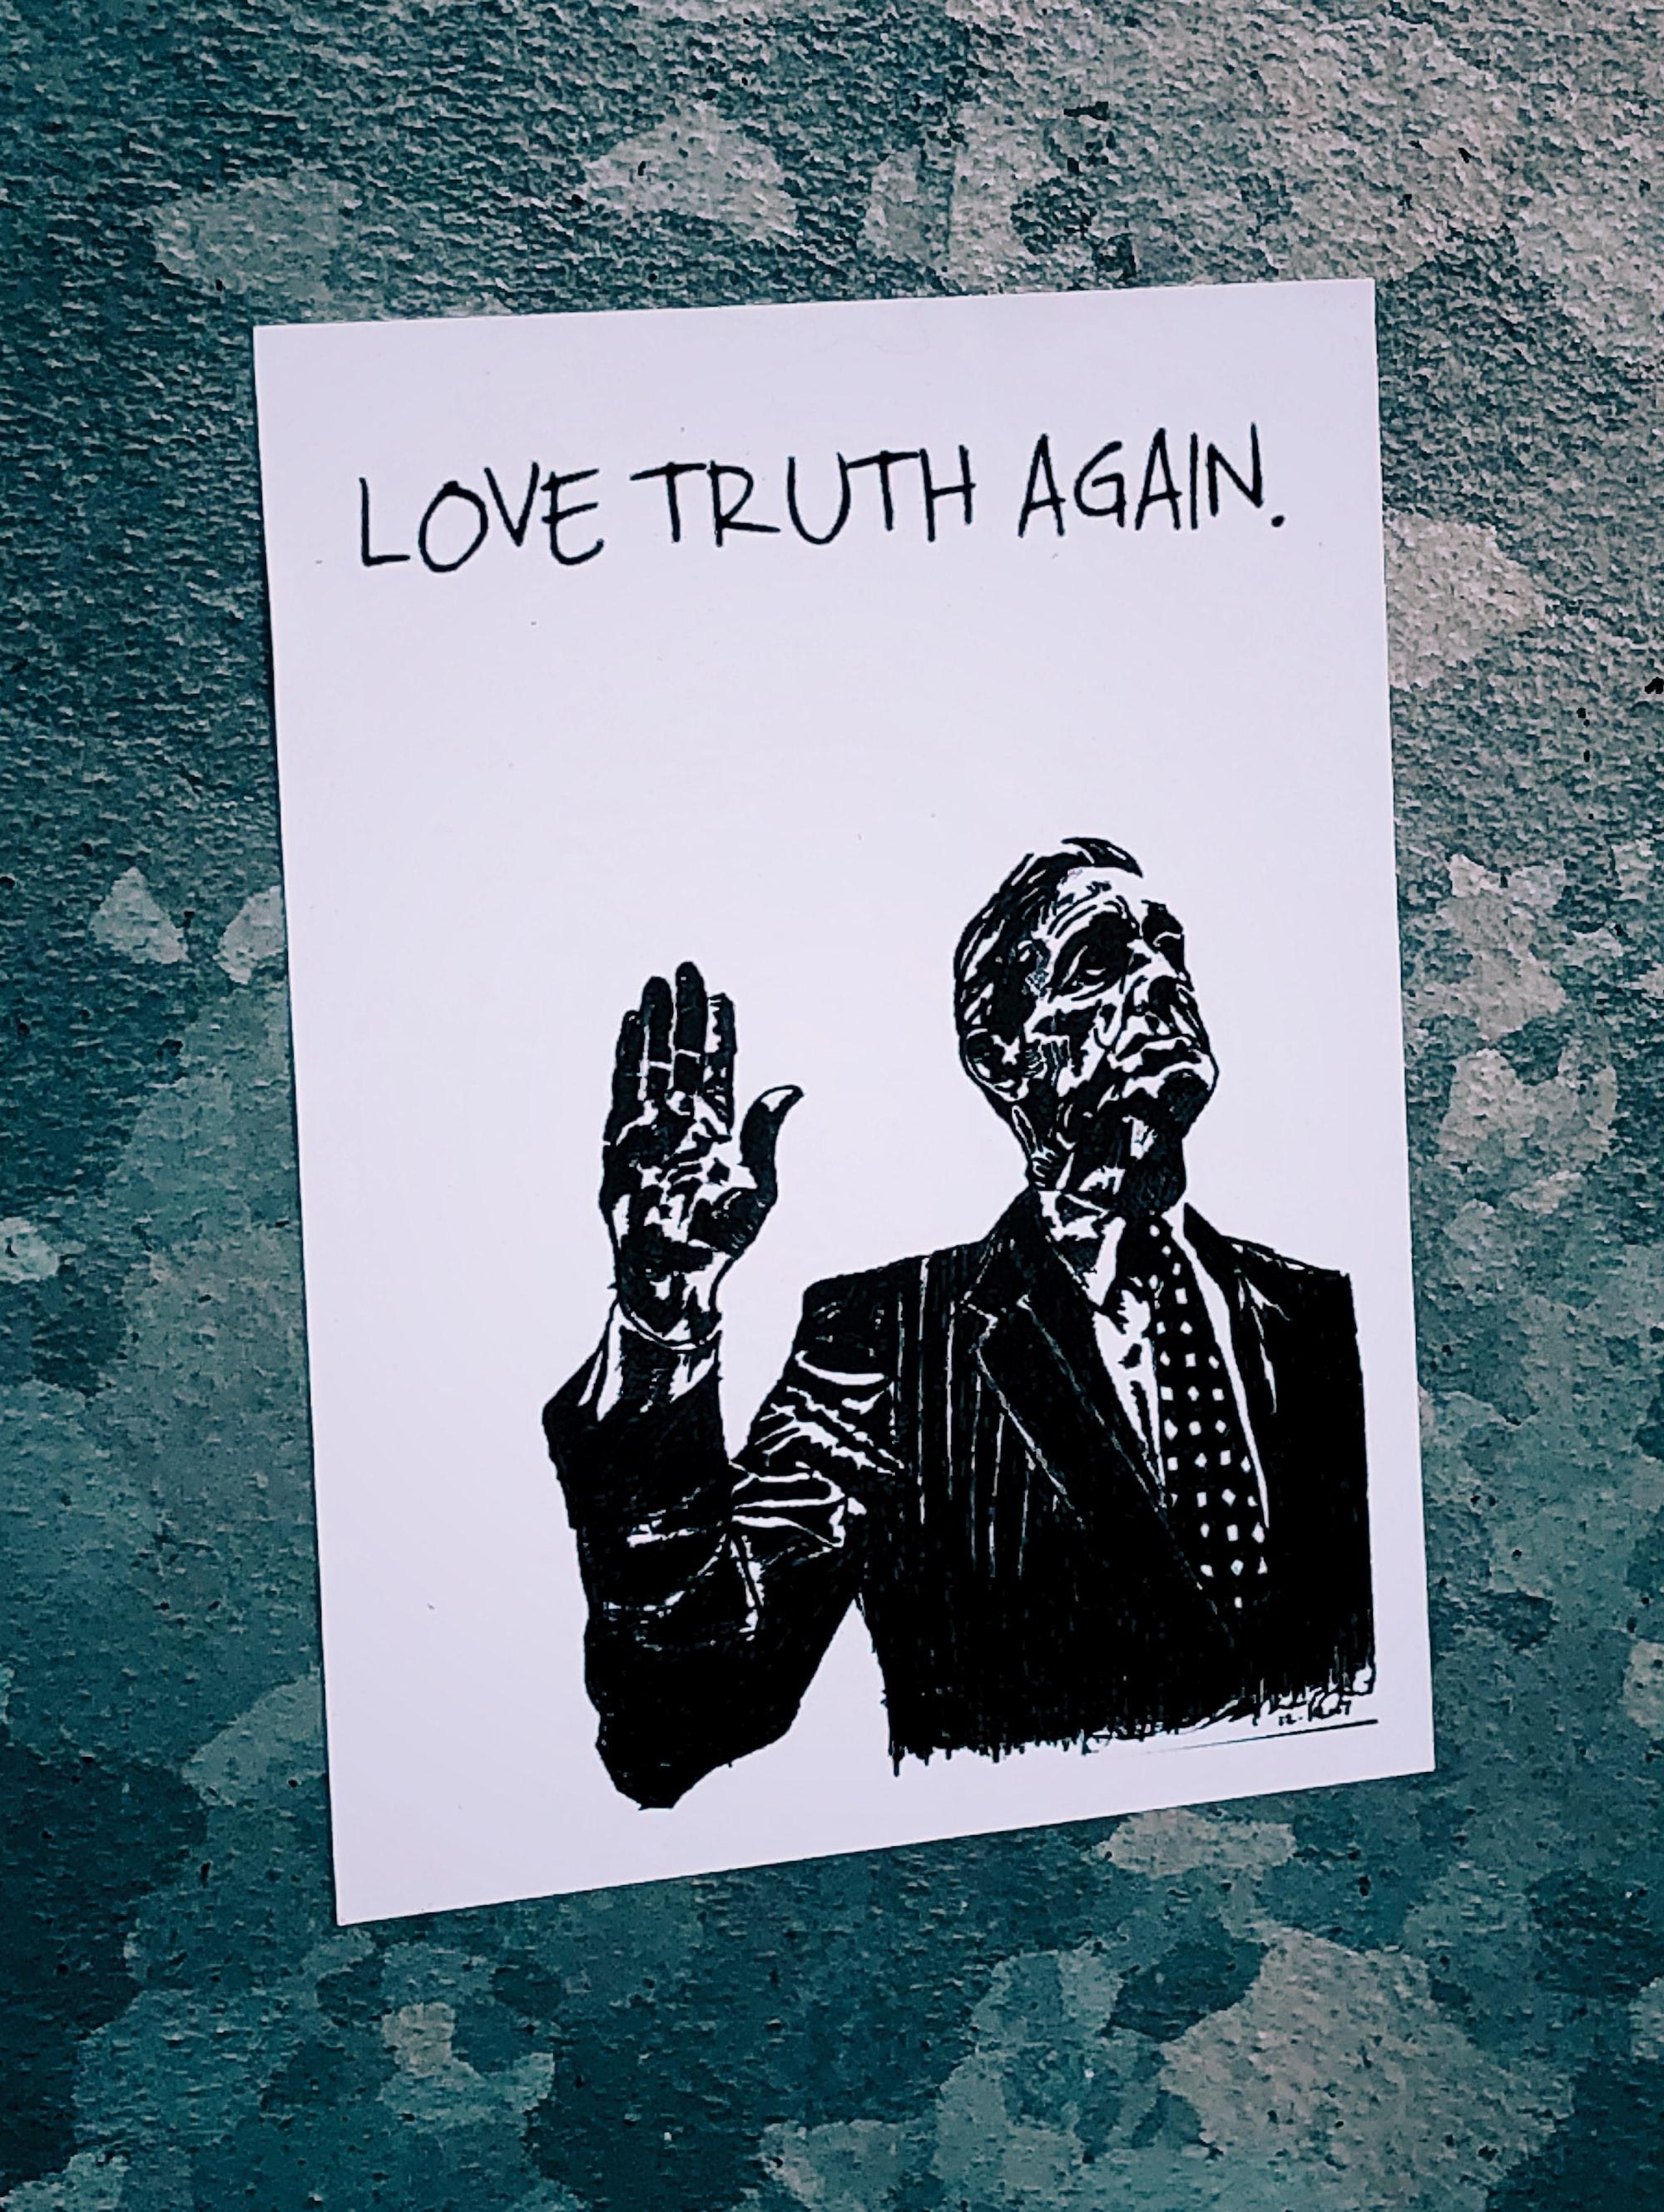 Post-Truth, Post-Trump